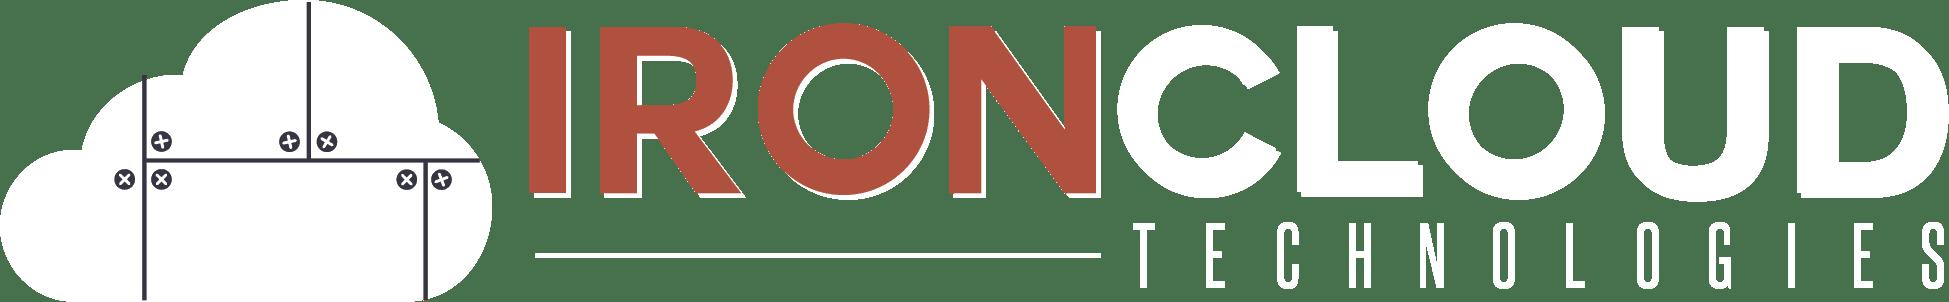 IronCloud logo-white